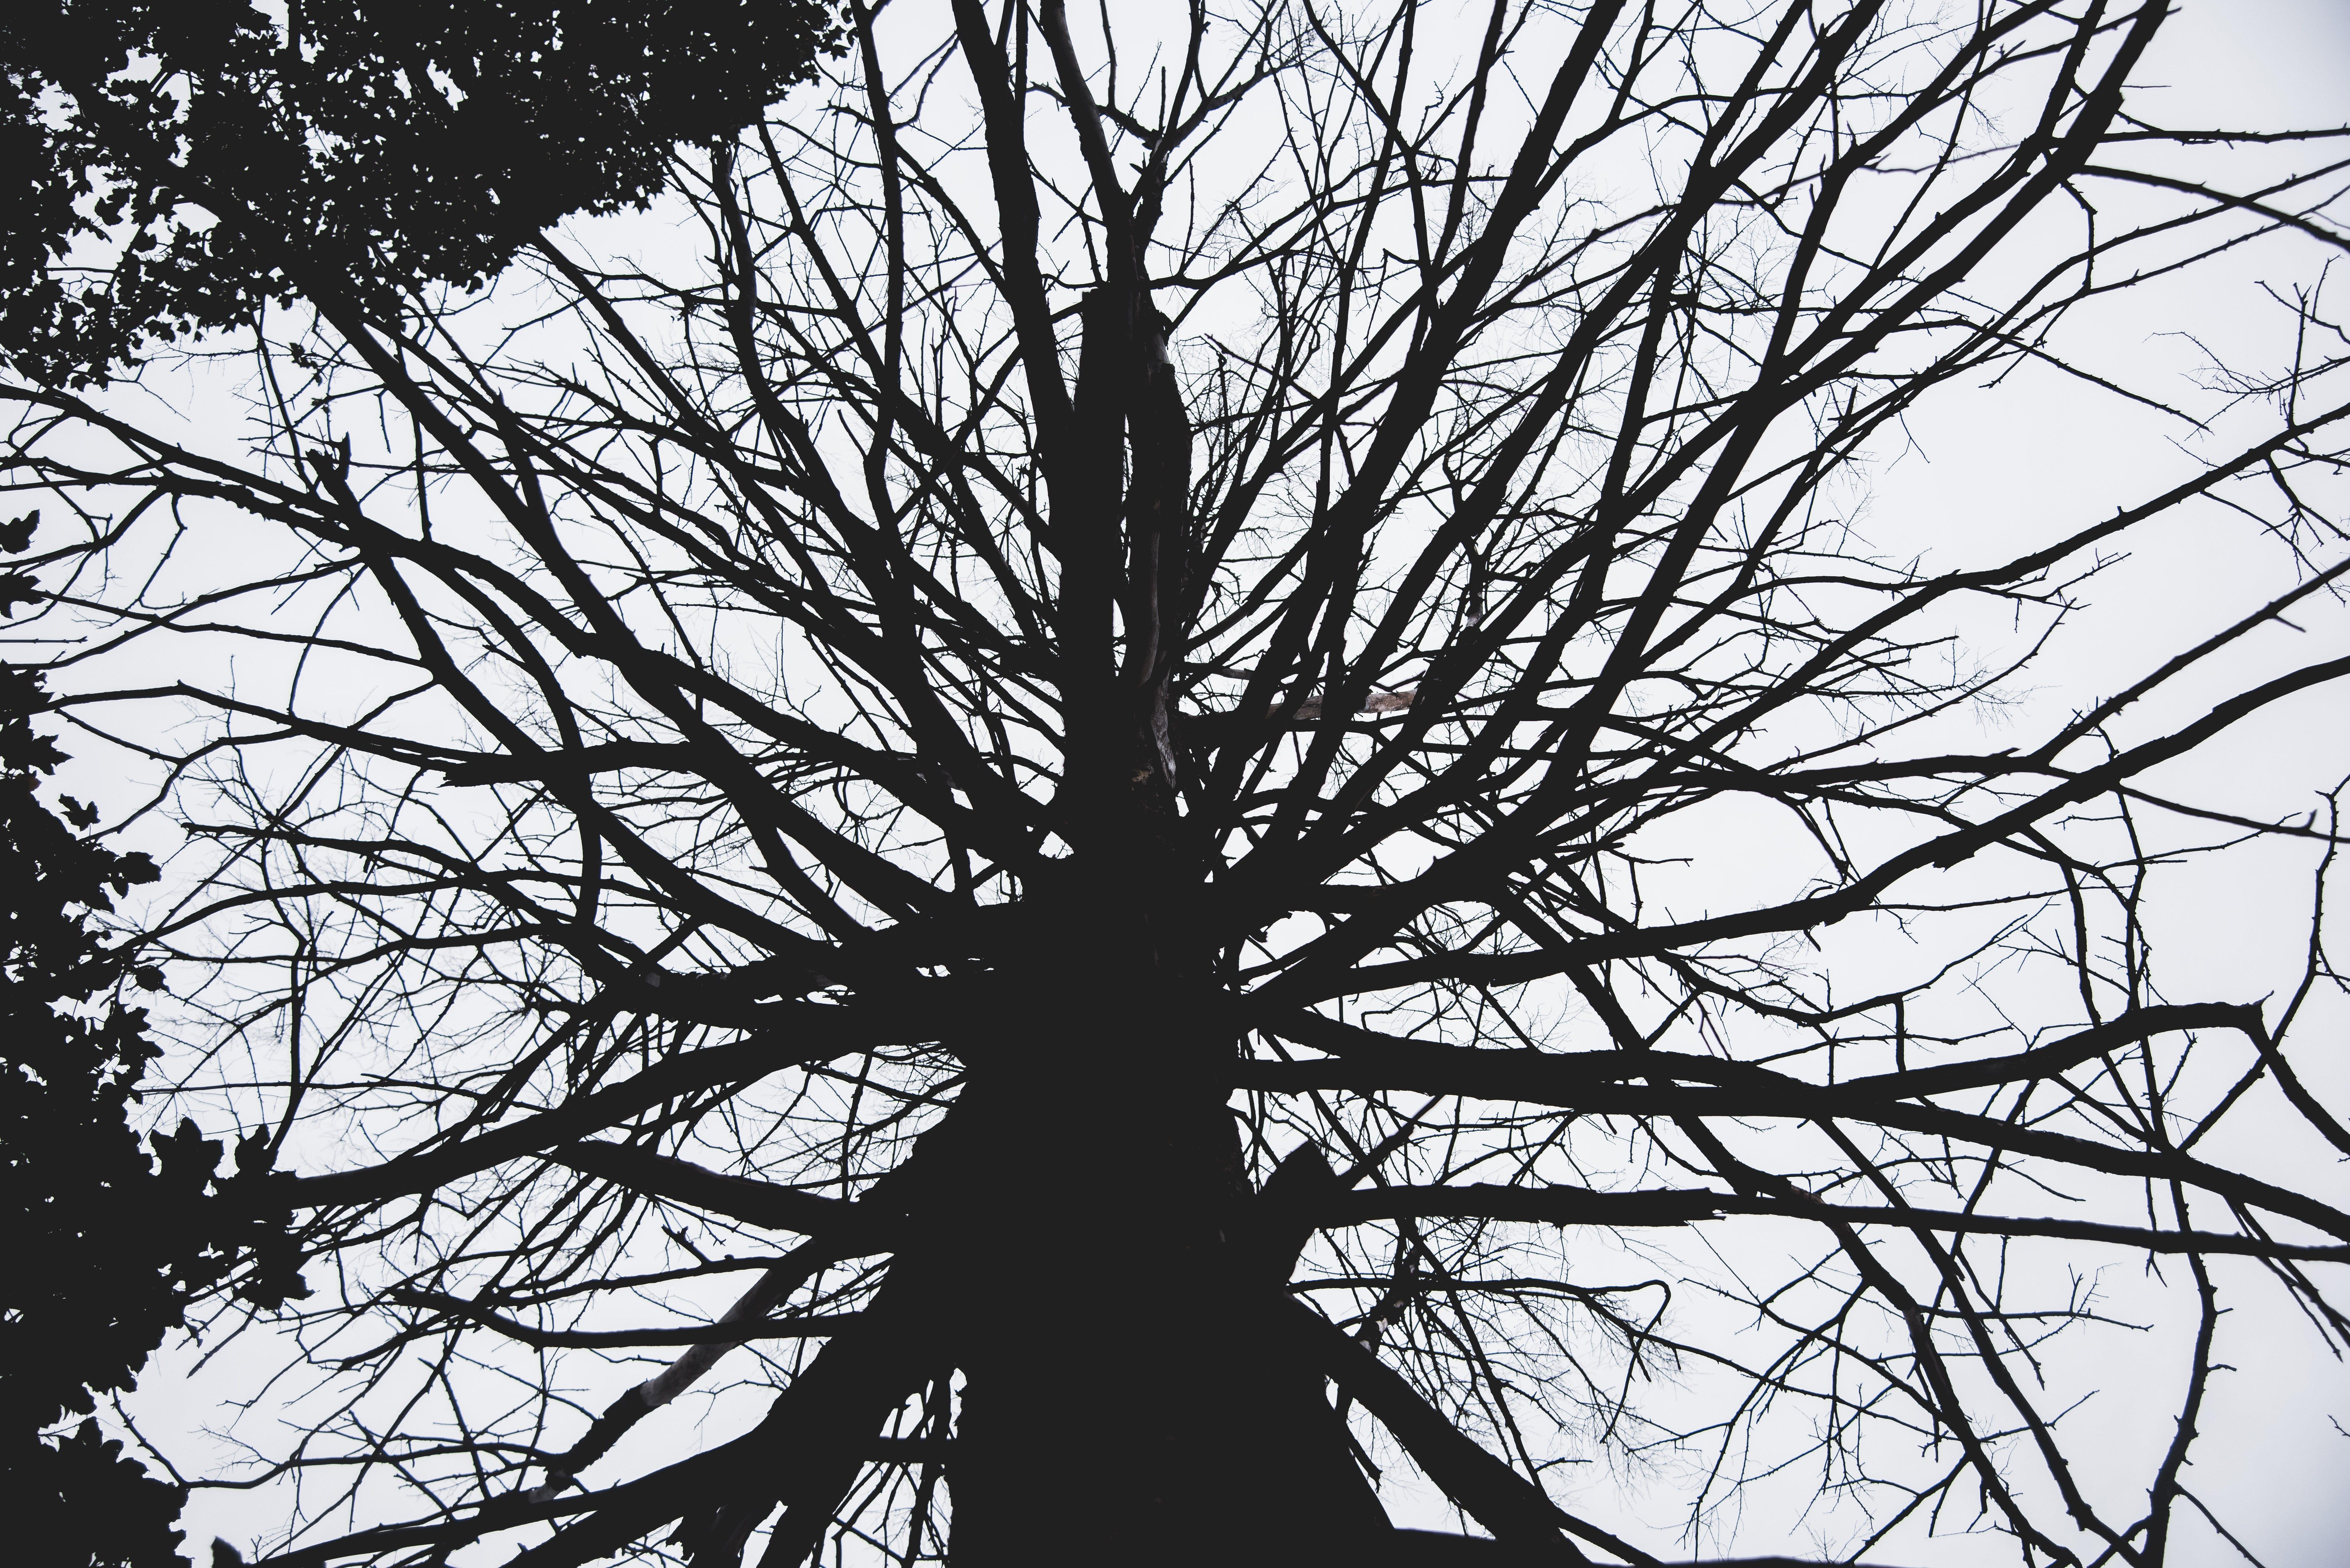 Free stock photo of trees, fall